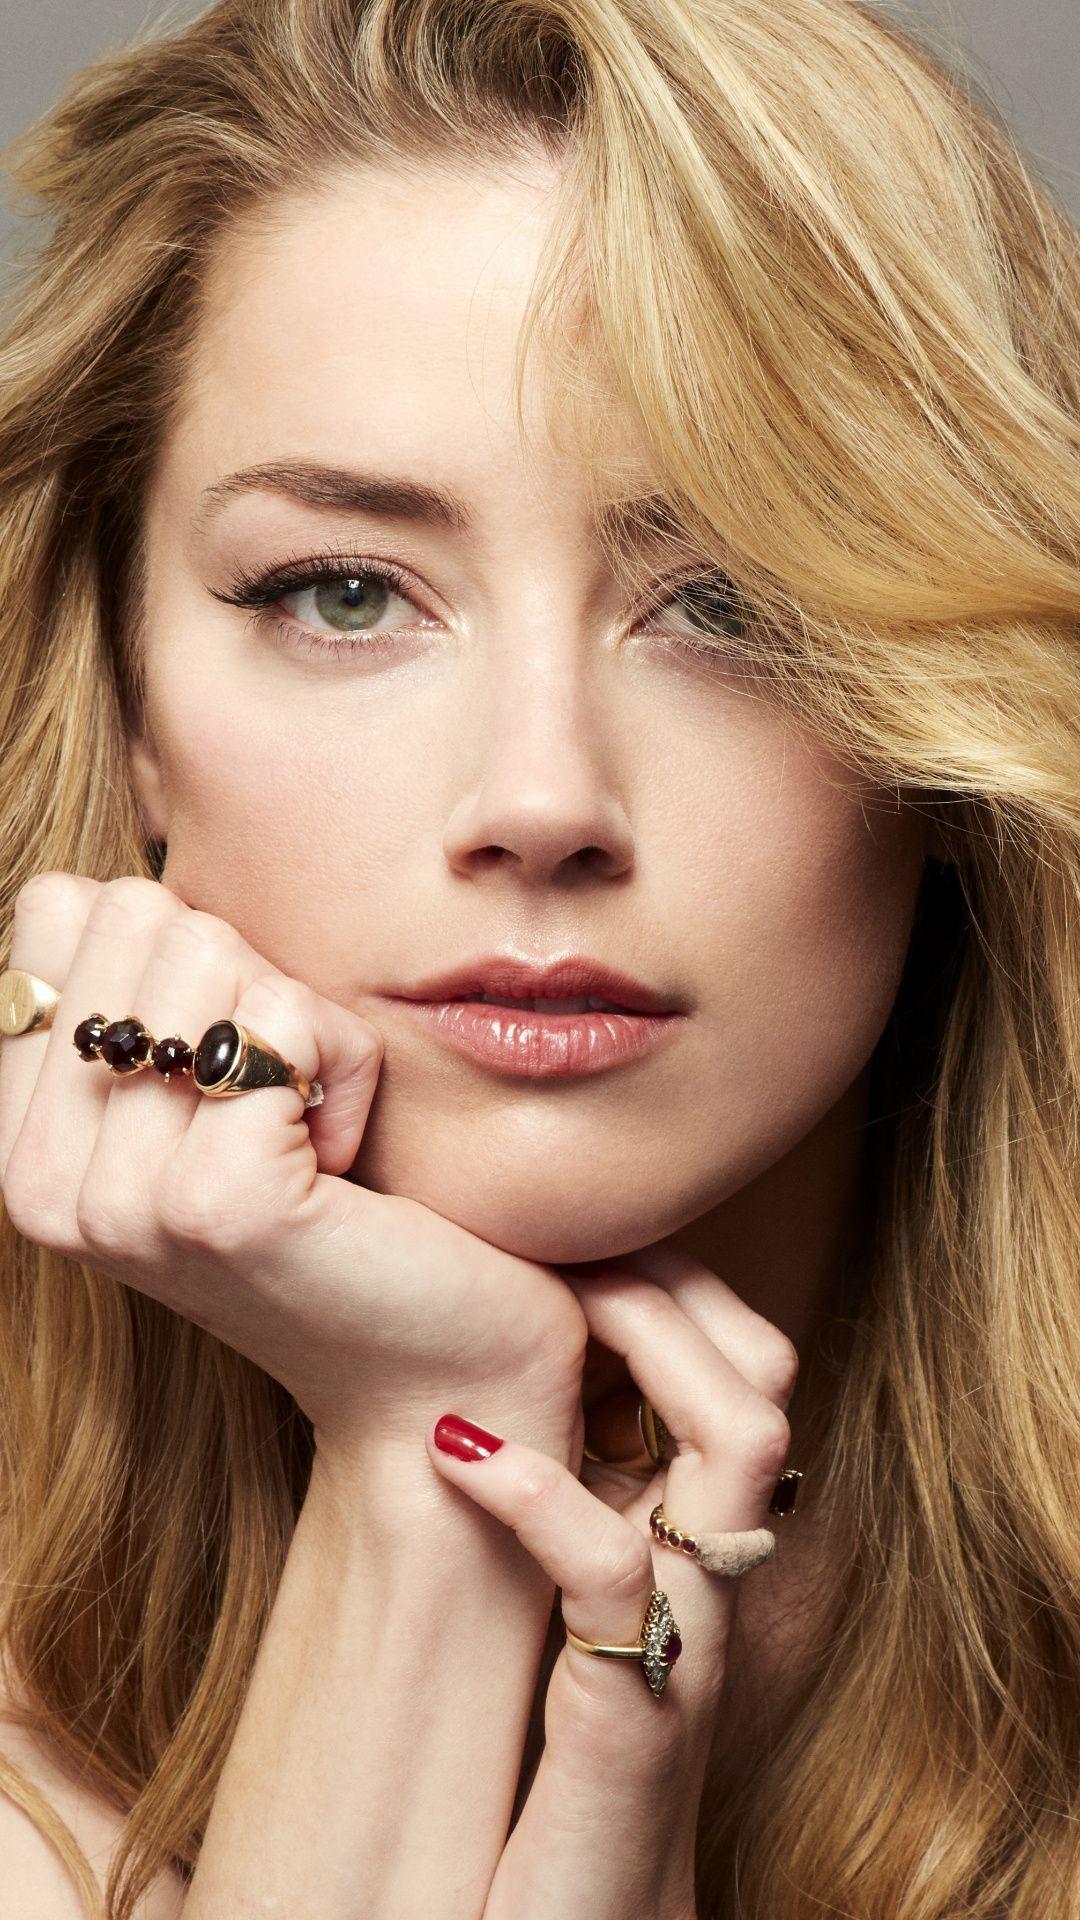 Amber Heard famous celebrity red head 1080x1920 wallpaper 1080x1920